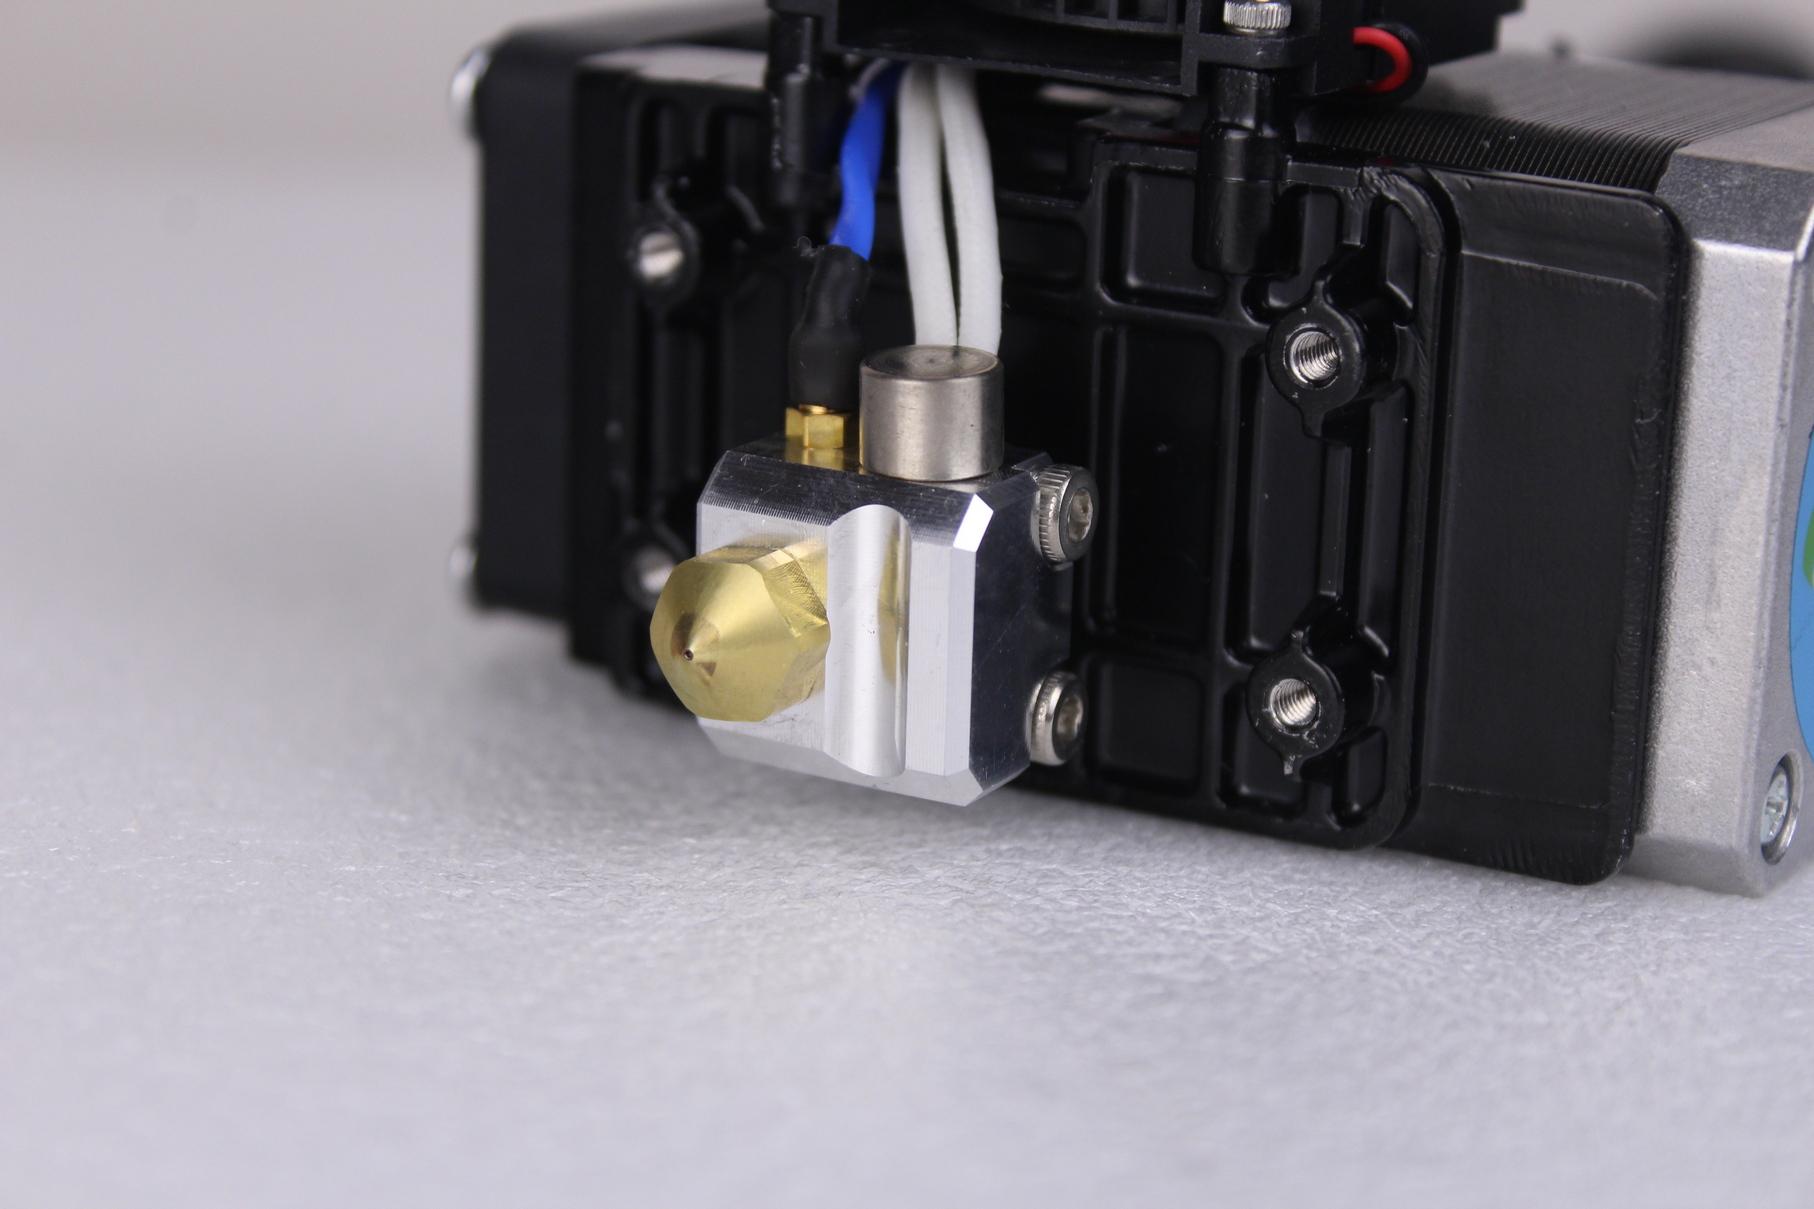 Flashforge-Creator-Pro-2-Direct-Drive-extruders-1